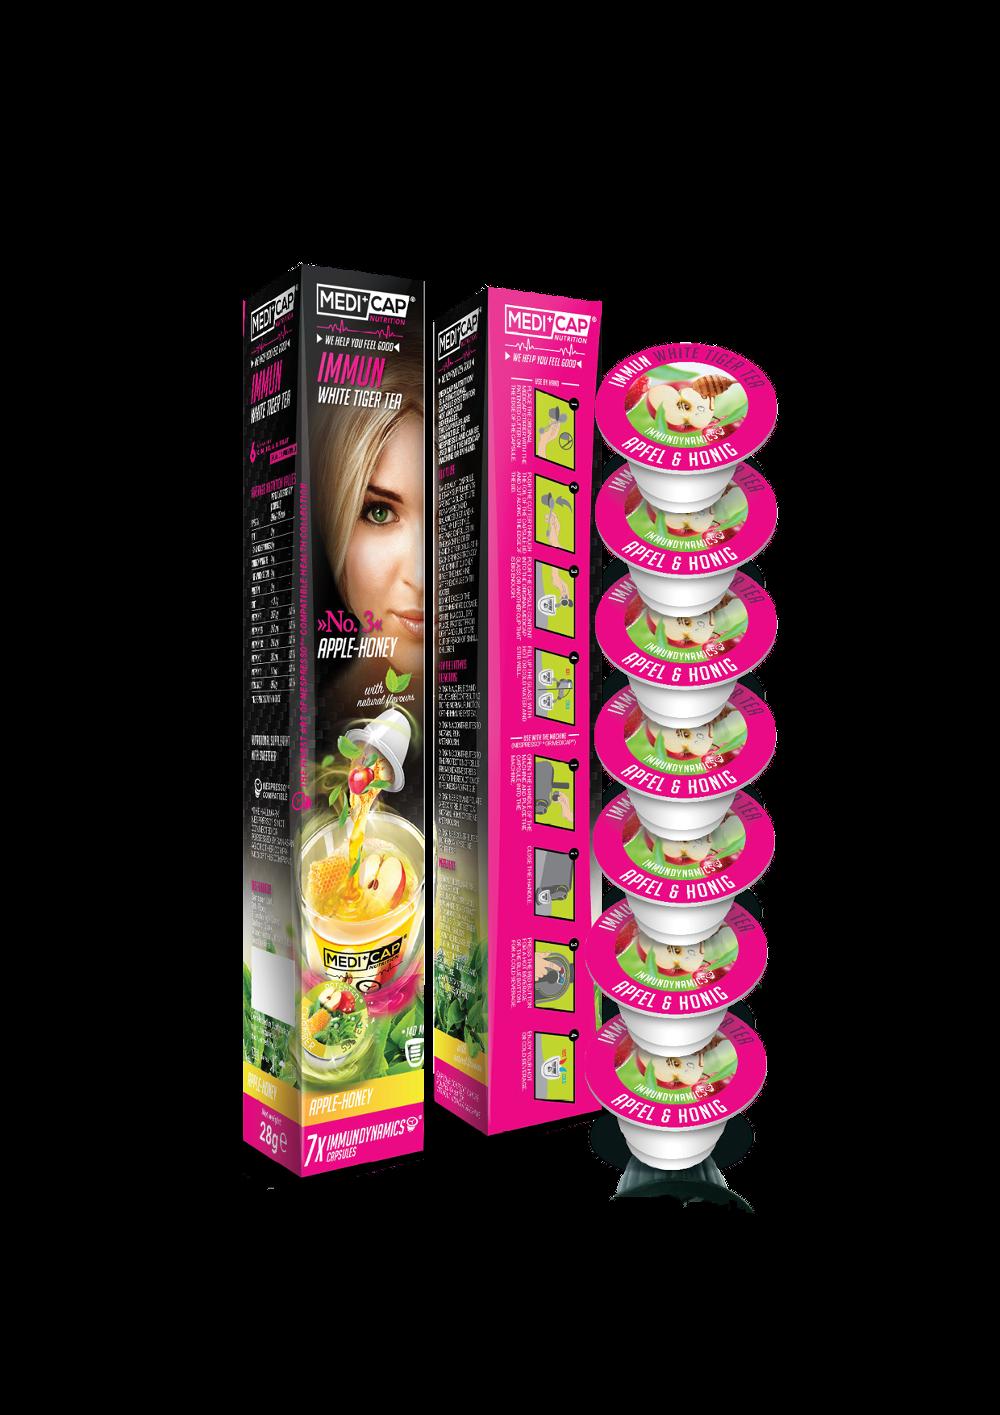 Exklusiv bei Manor: Medicap Immun Kapseln, White Tiger Tea, Apfel-Honig, 7 Stück CHF 9.90